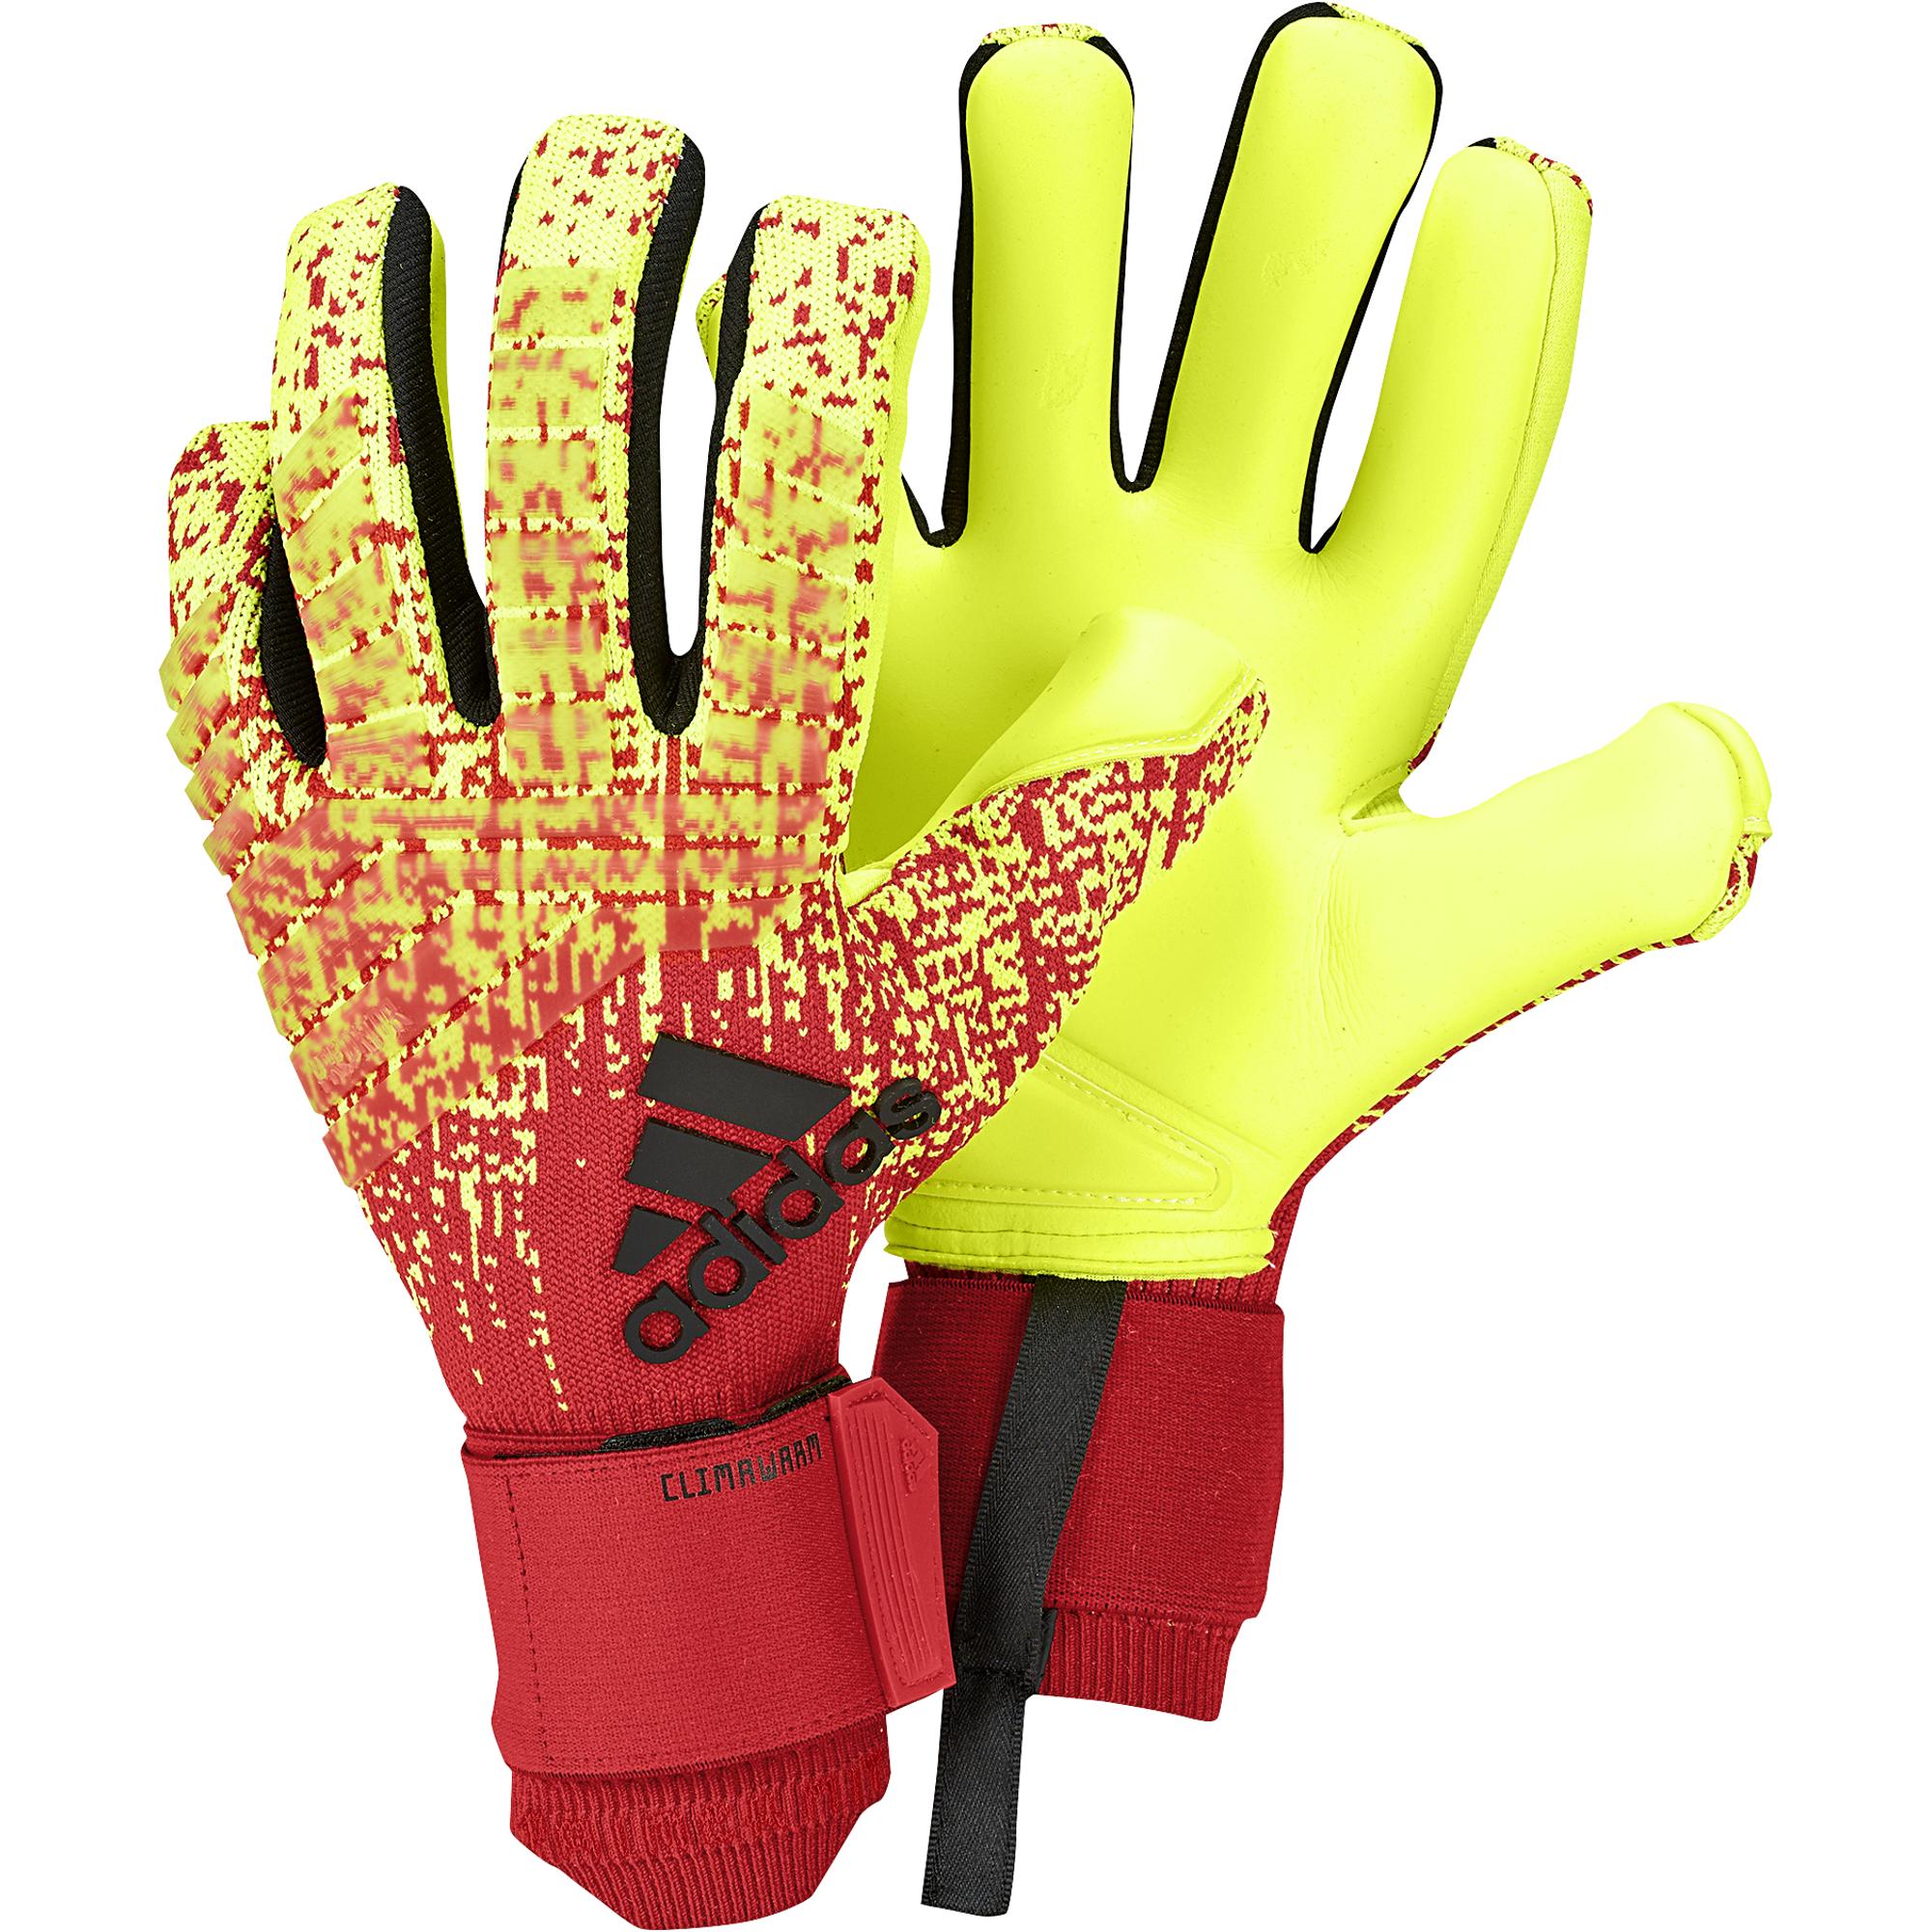 ADIDAS brankářské rukavice Predator Pro Climawarm